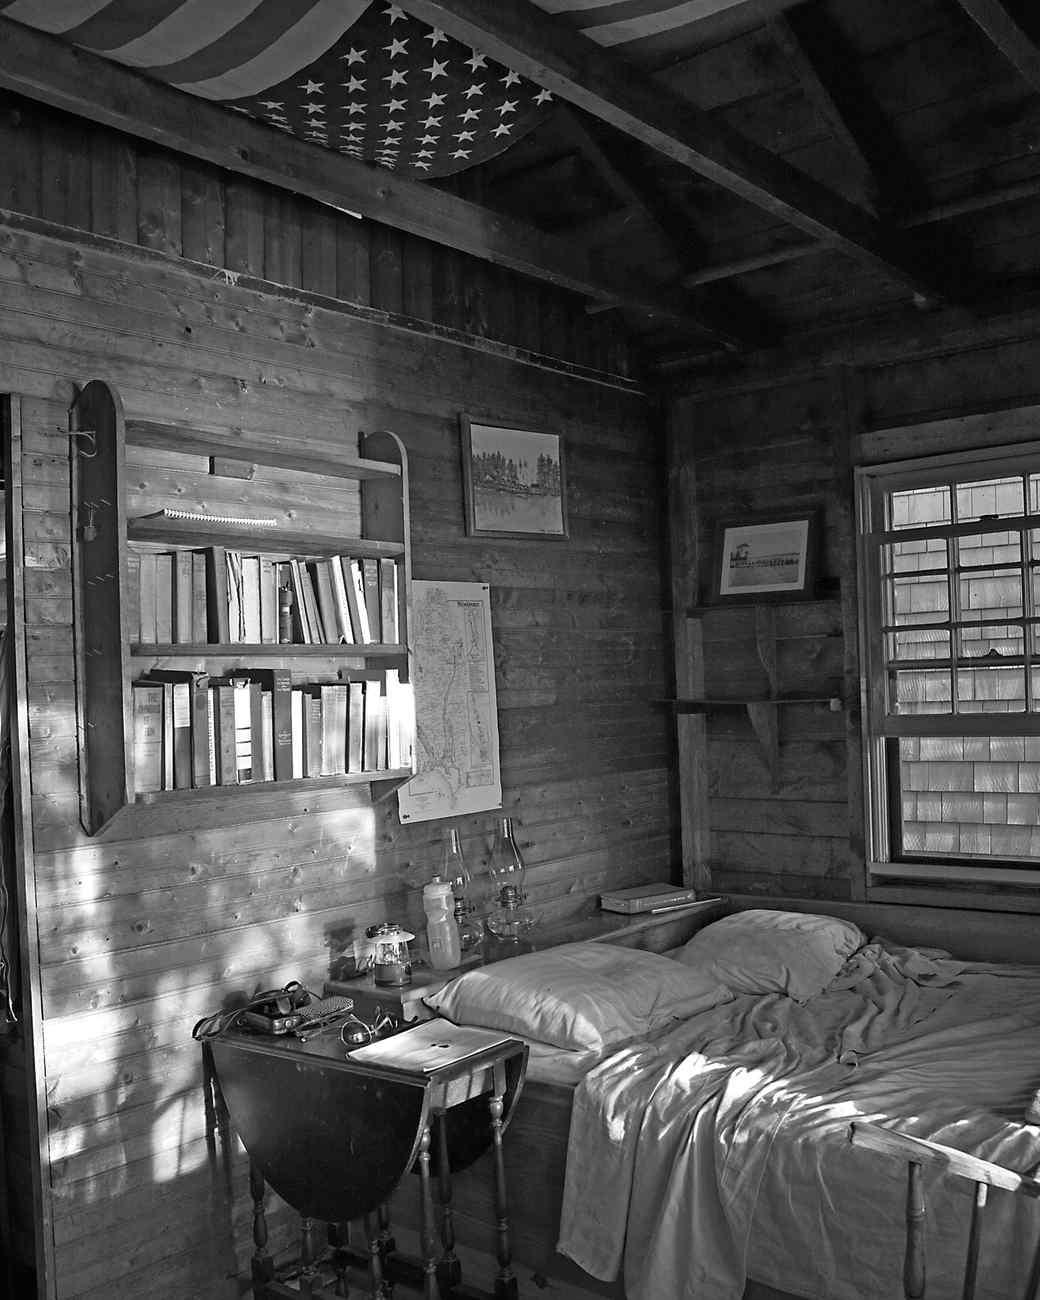 pine-island-summer-camp-ms108559-744.jpg